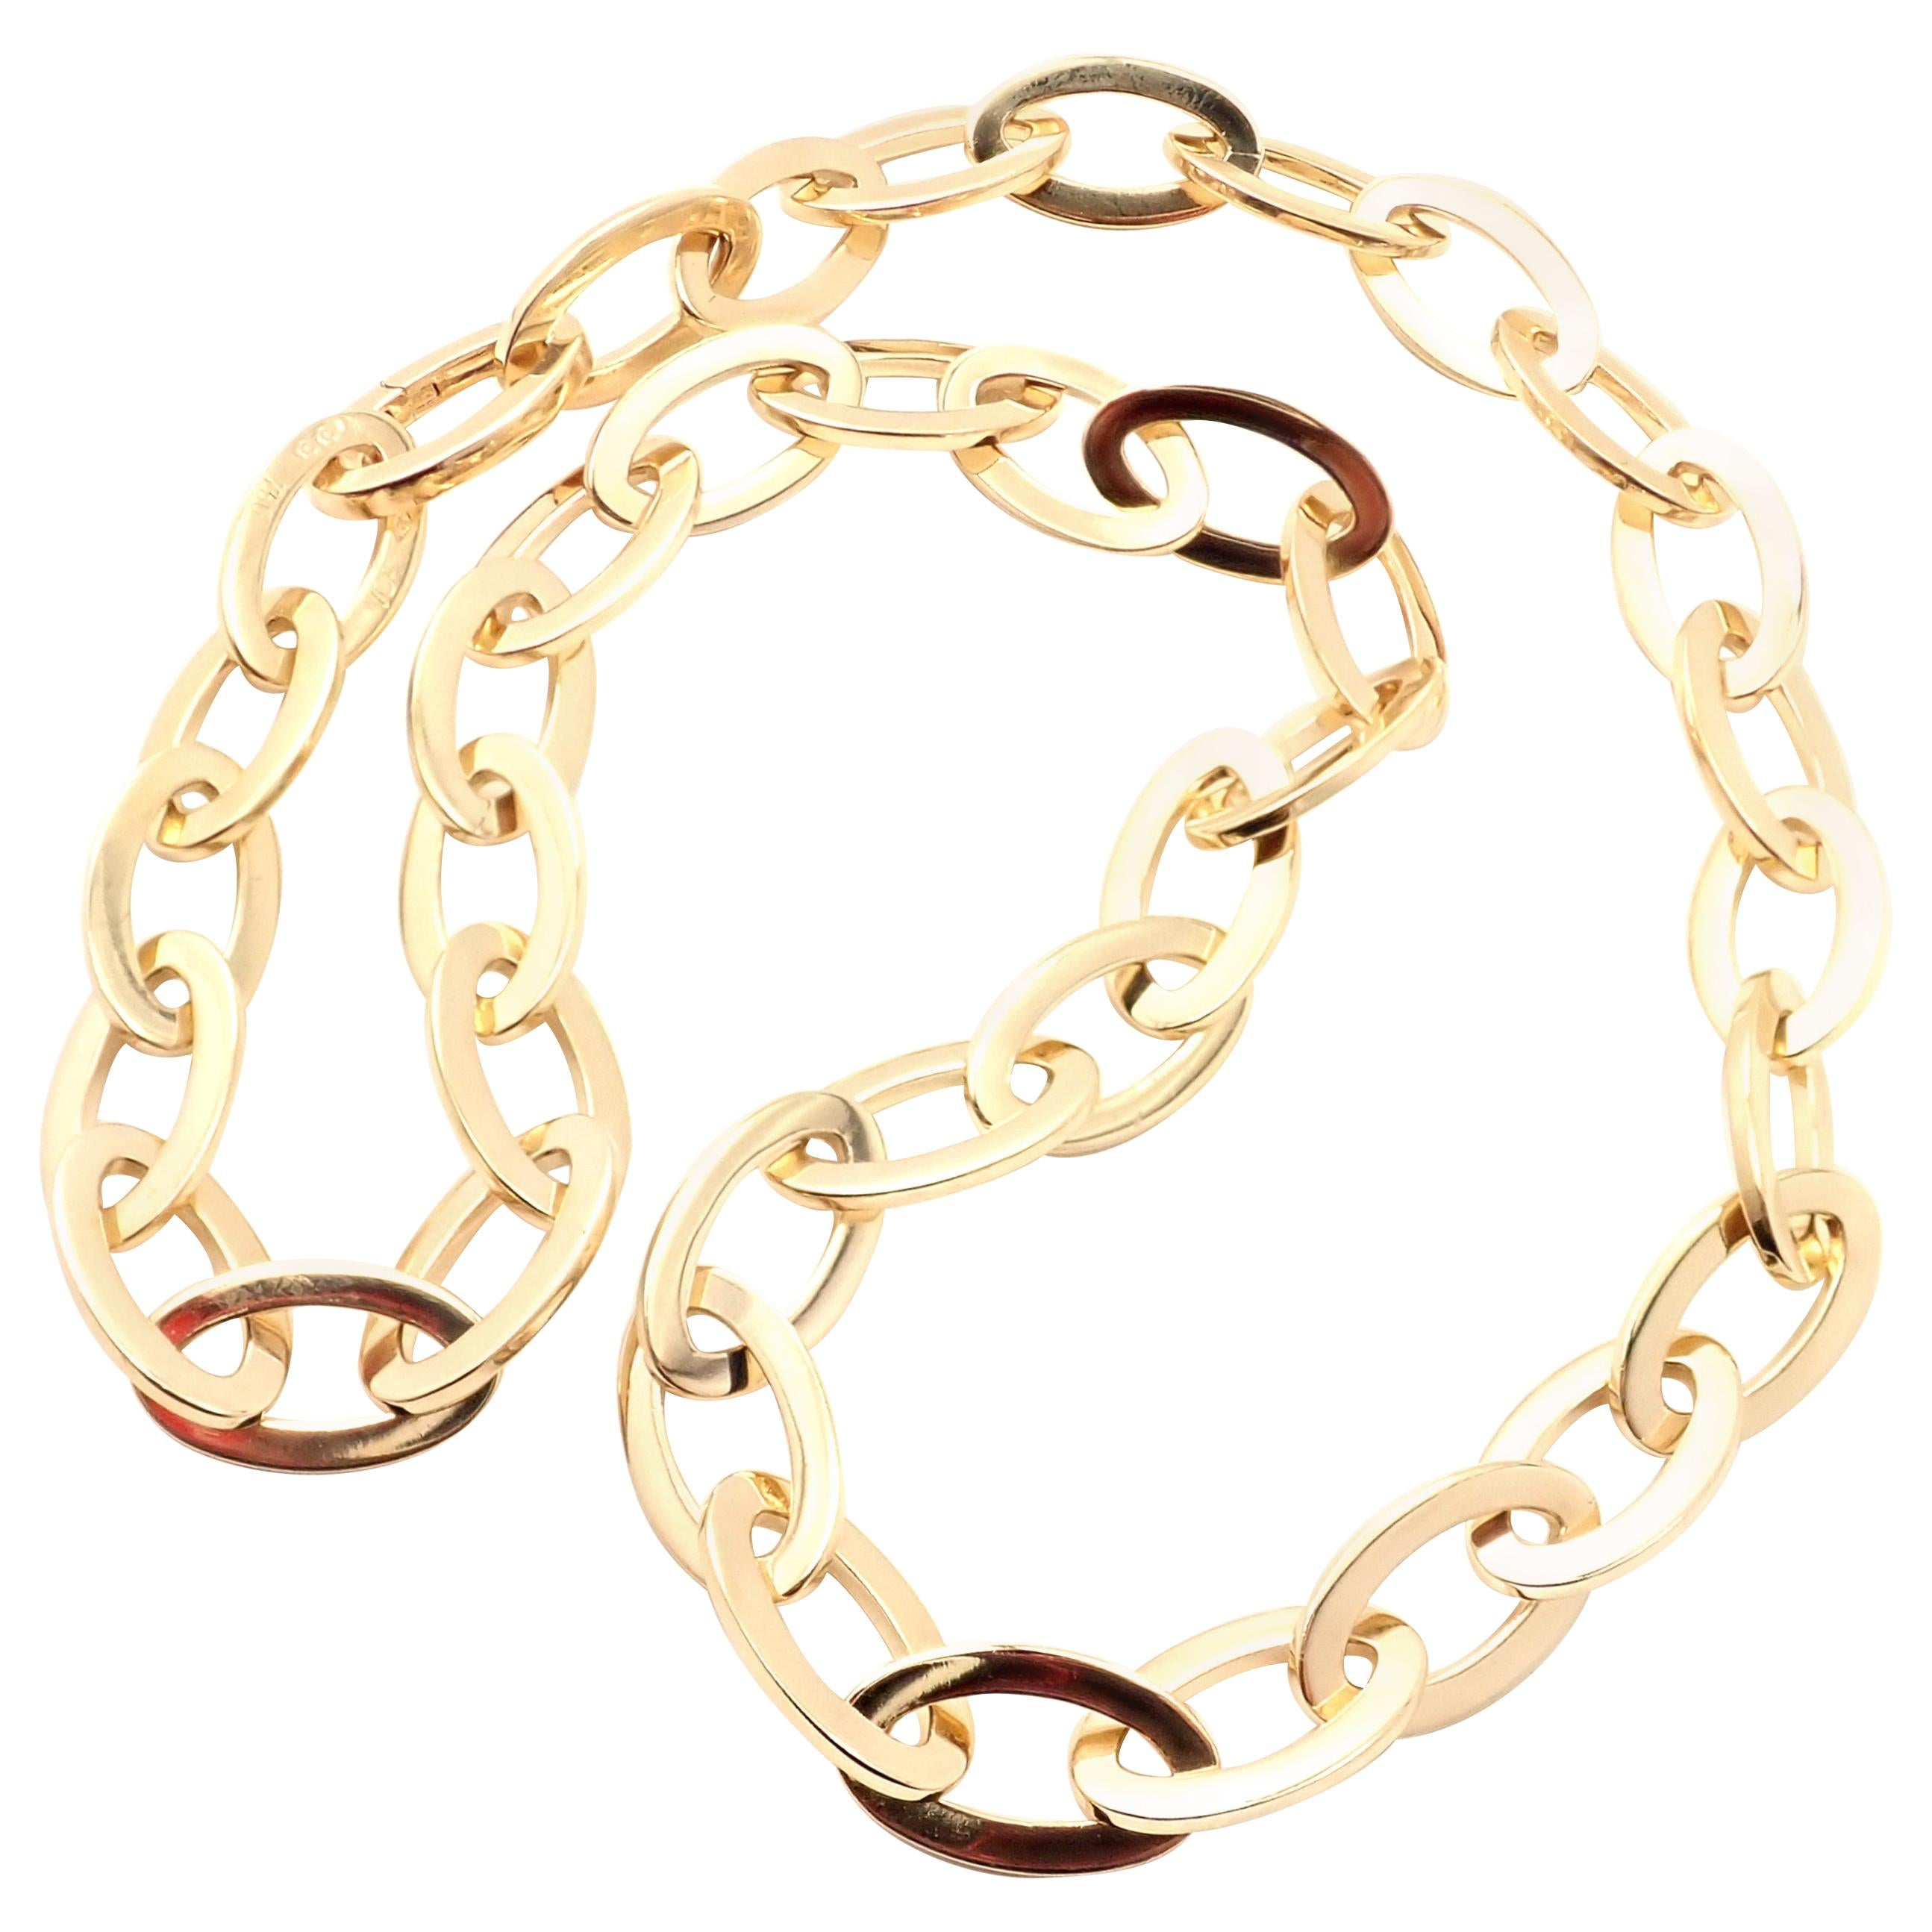 Van Cleef & Arpels Oval Link Yellow Gold Necklace